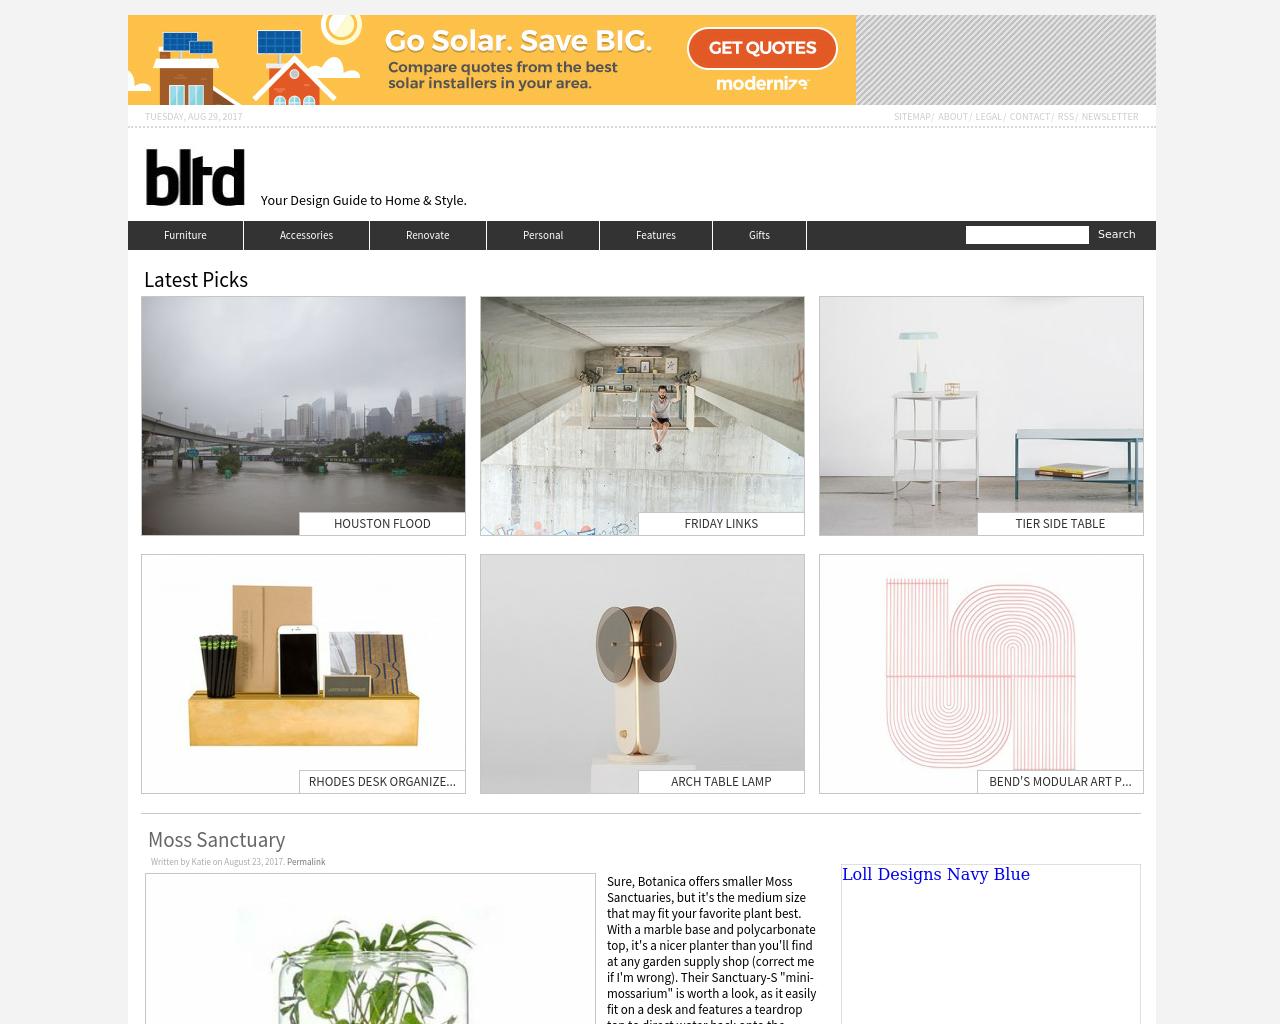 Better-Living-Through-Design-Advertising-Reviews-Pricing